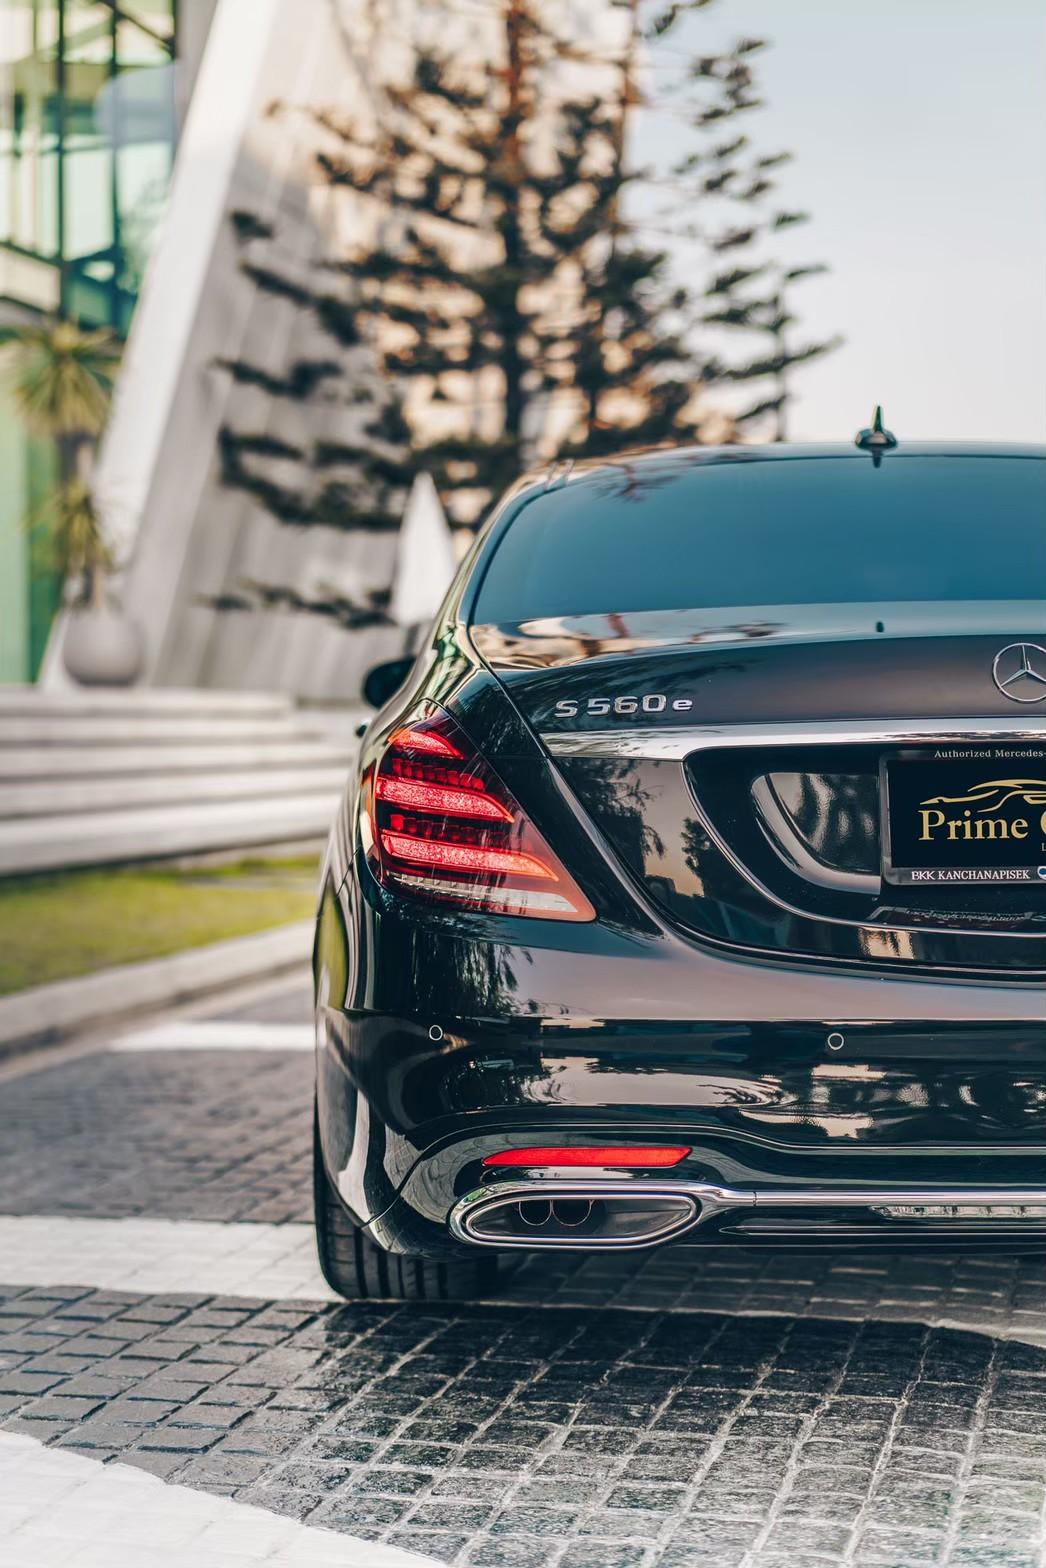 Mercedes-Benz S-Class 560e AMG Premium